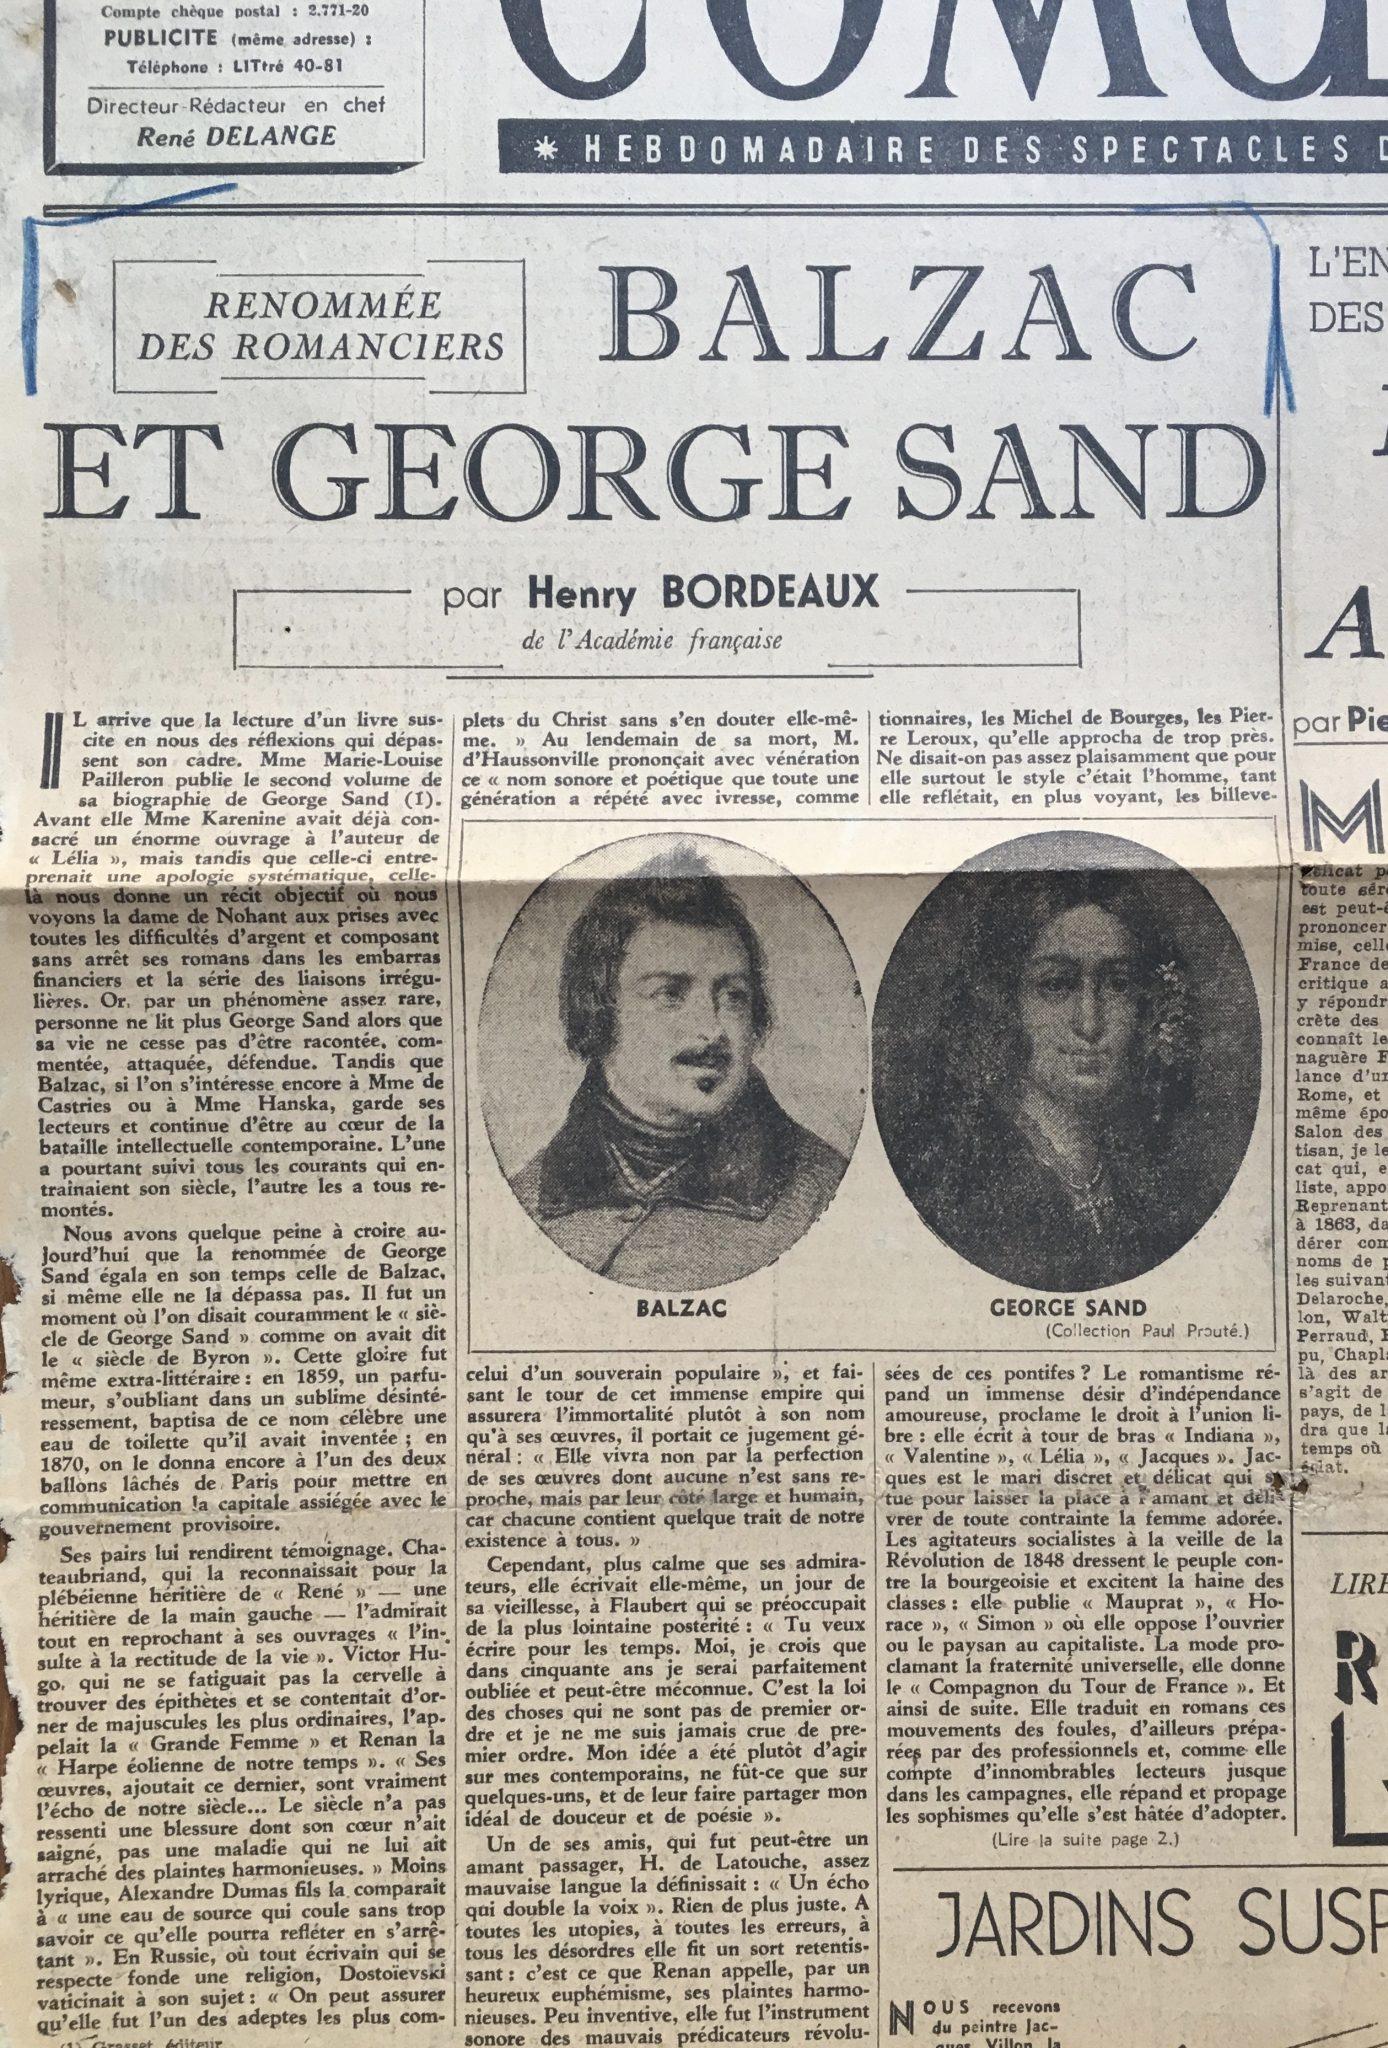 Balzac et George Sand 1943